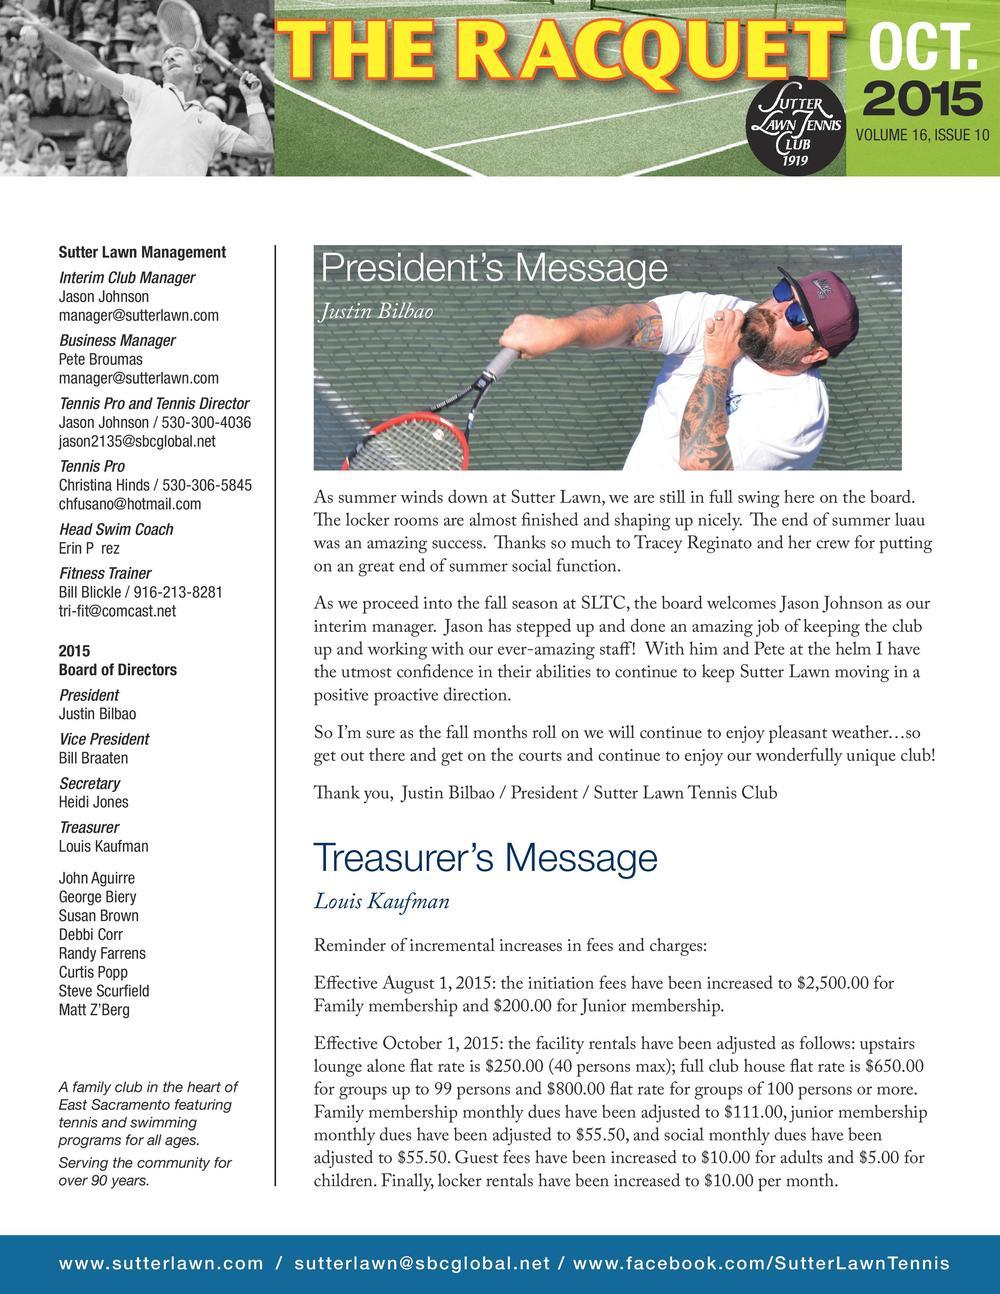 SL_10_15_October-page-001.jpg